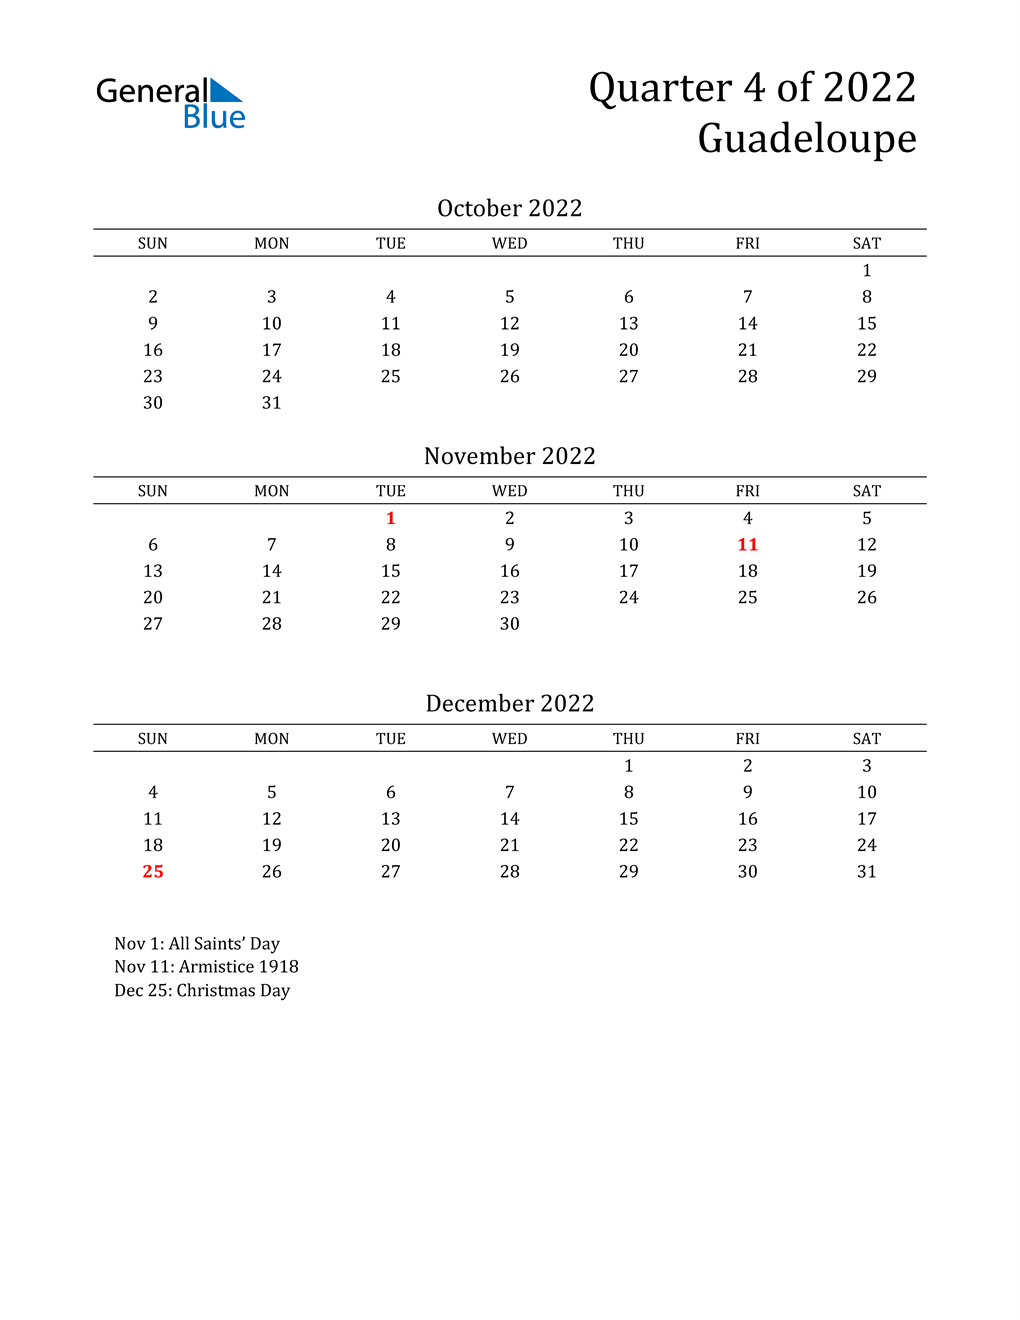 2022 Guadeloupe Quarterly Calendar